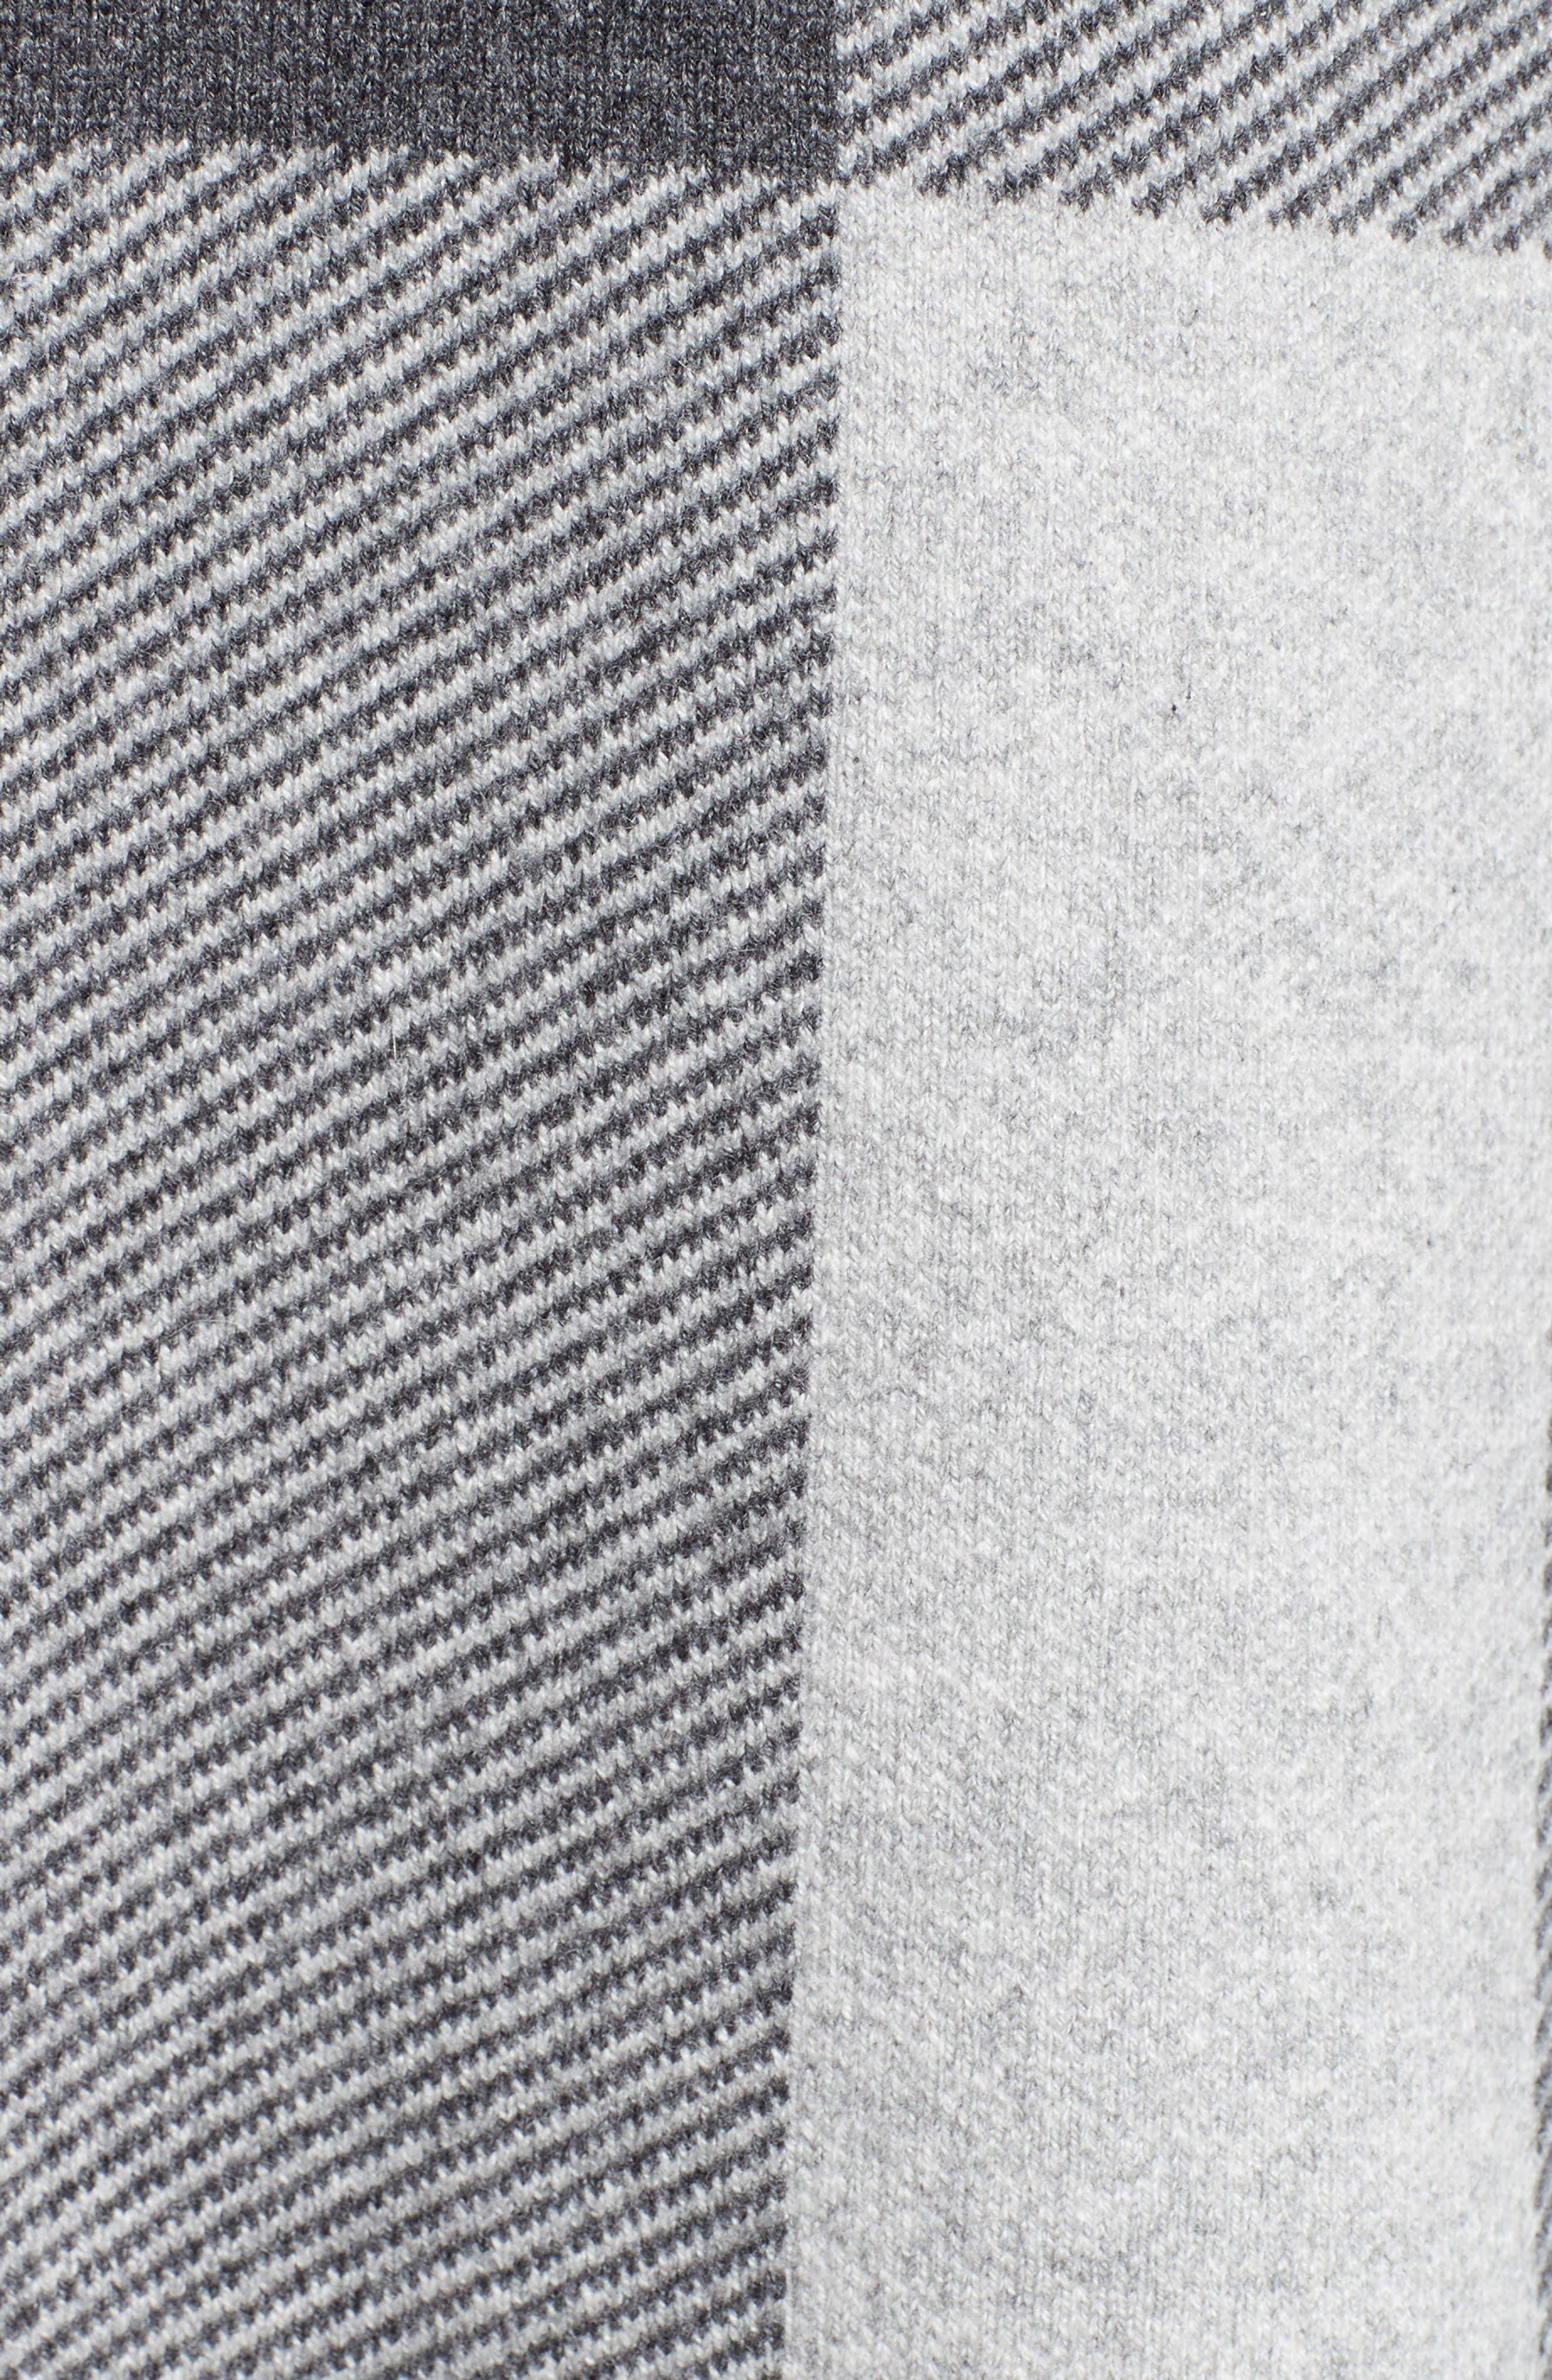 Gorlan Oversize Open Cardigan,                             Alternate thumbnail 3, color,                             Pale Grey Melange